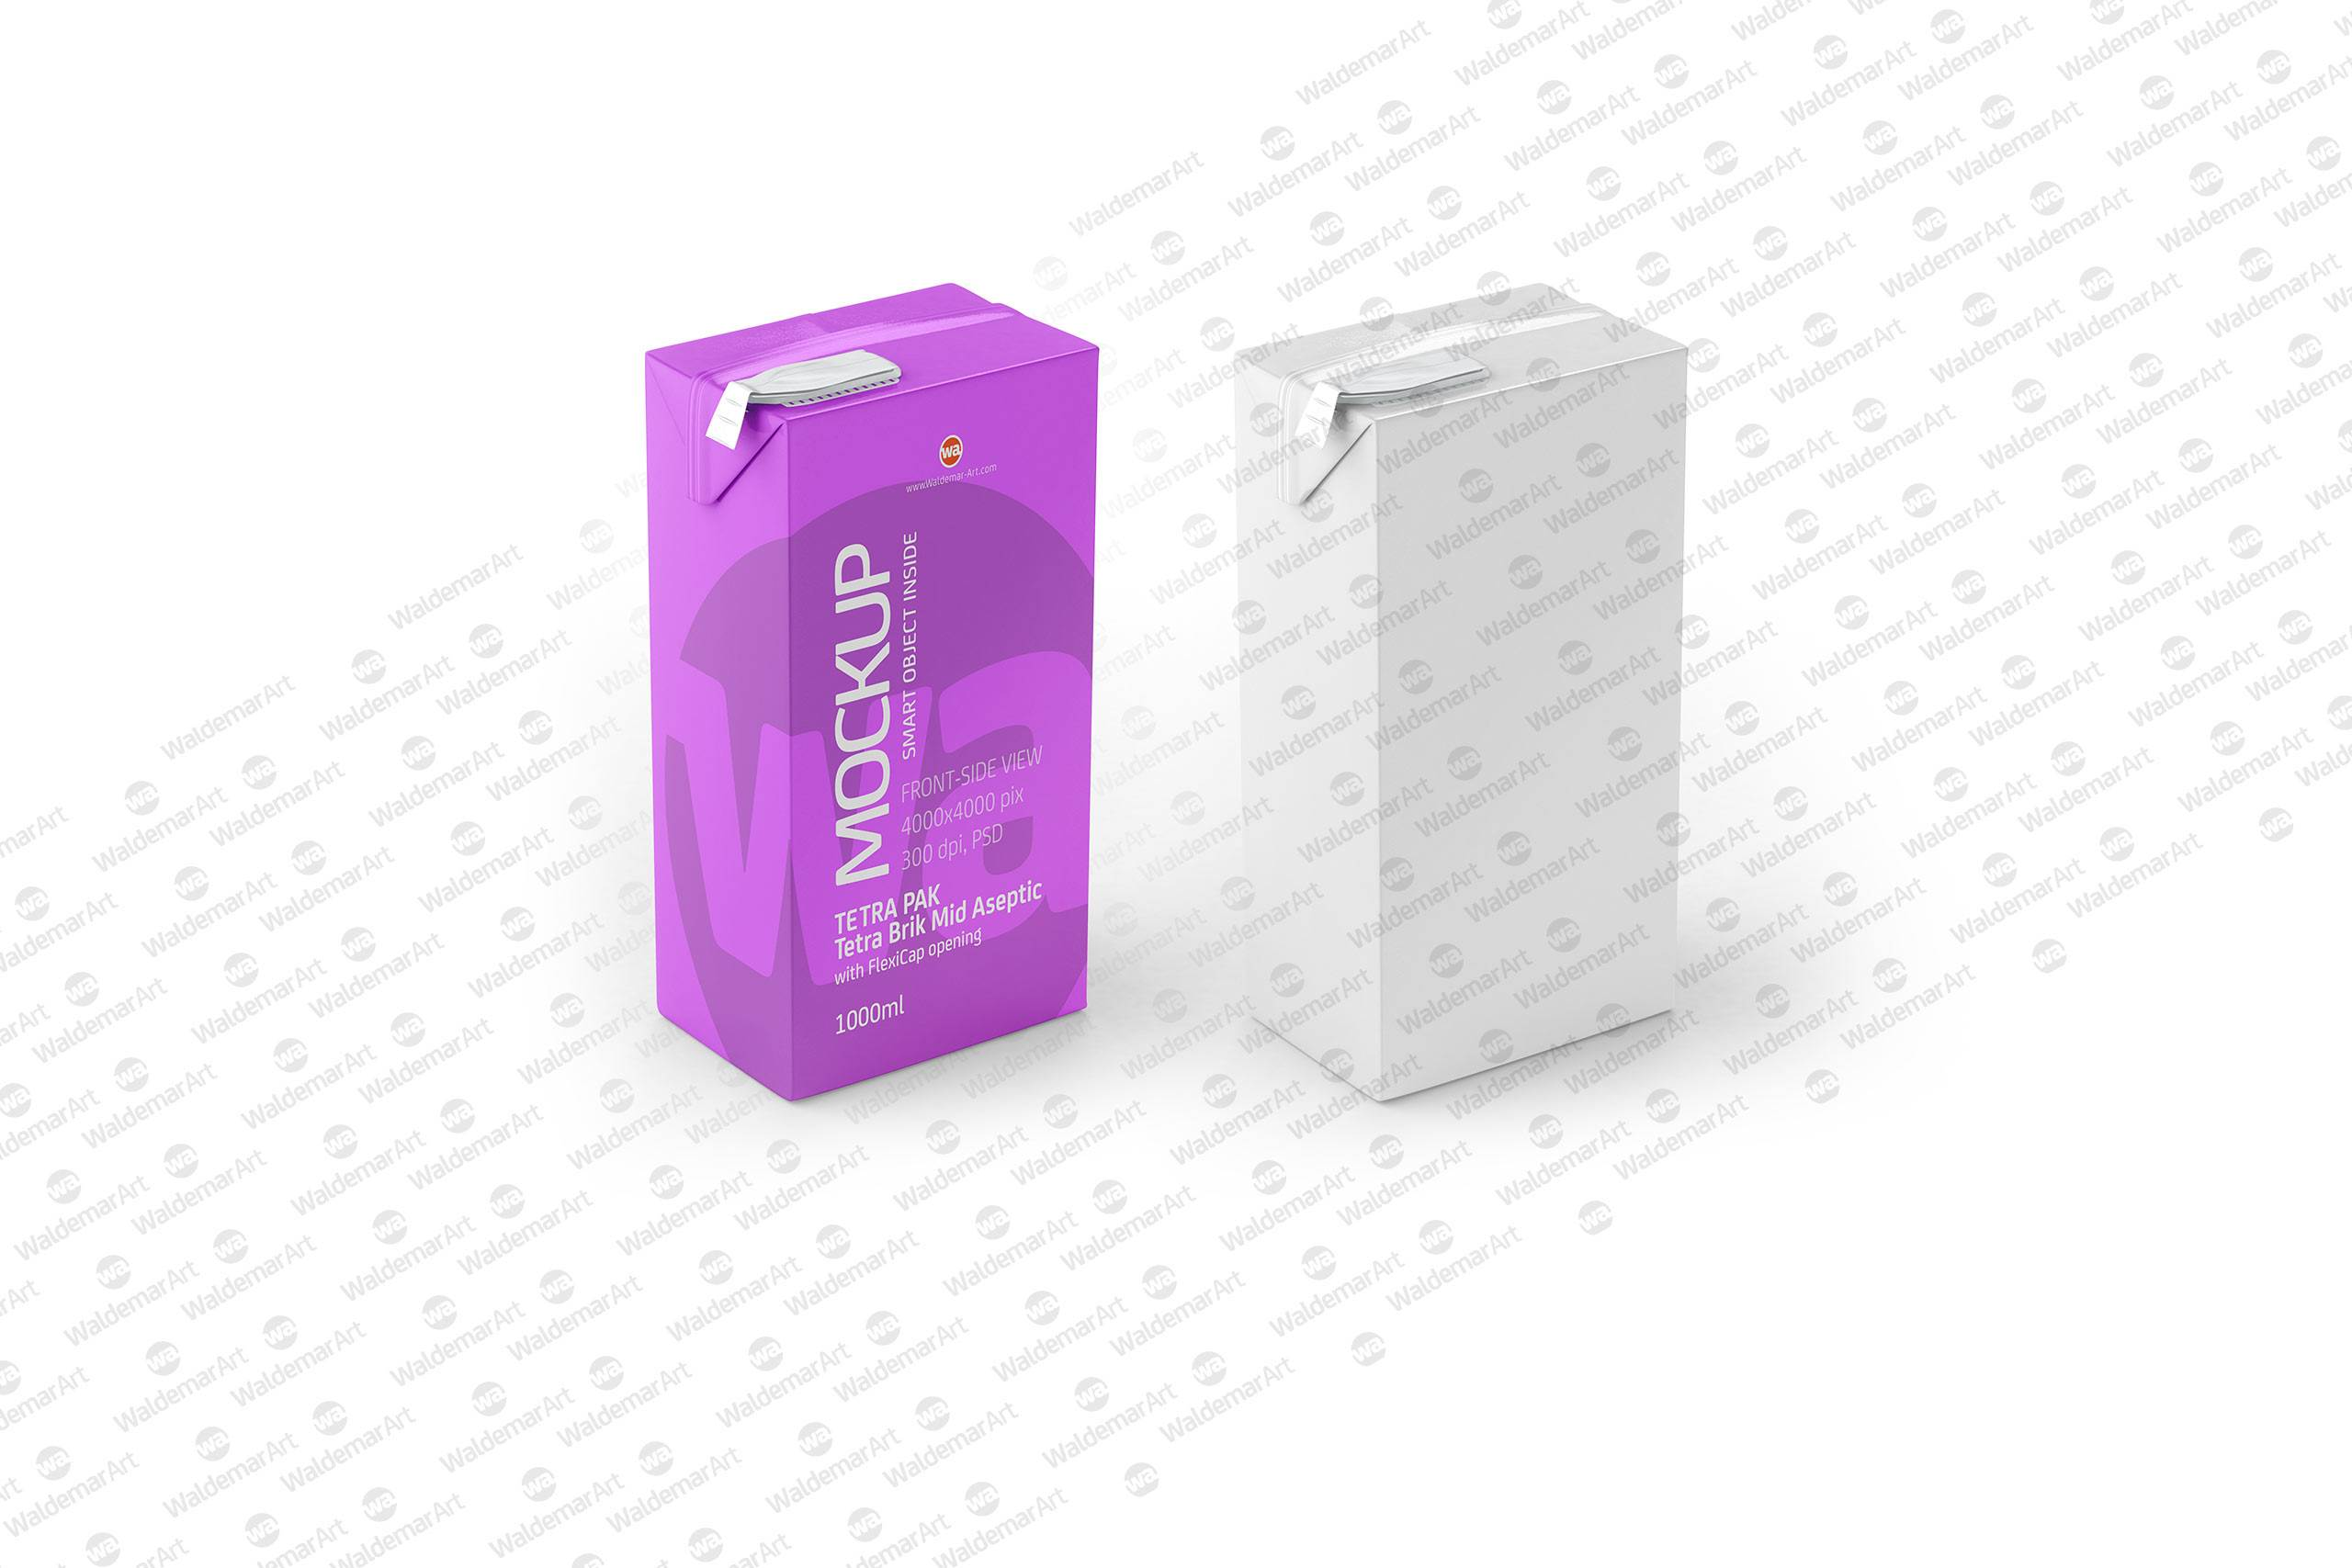 packaging mockup of tetra pack brick mid aseptic 1000ml